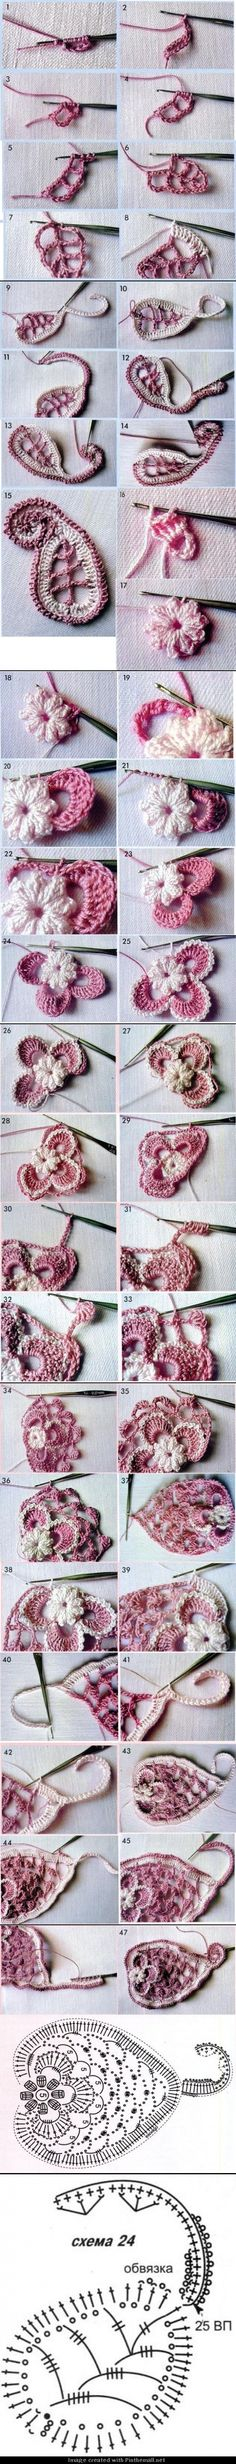 More divine irish crochet lace Irish Crochet Tutorial, Irish Crochet Patterns, Crochet Motifs, Crochet Diagram, Freeform Crochet, Crochet Stitches, Knitting Patterns, Crochet Paisley, Crochet Flowers